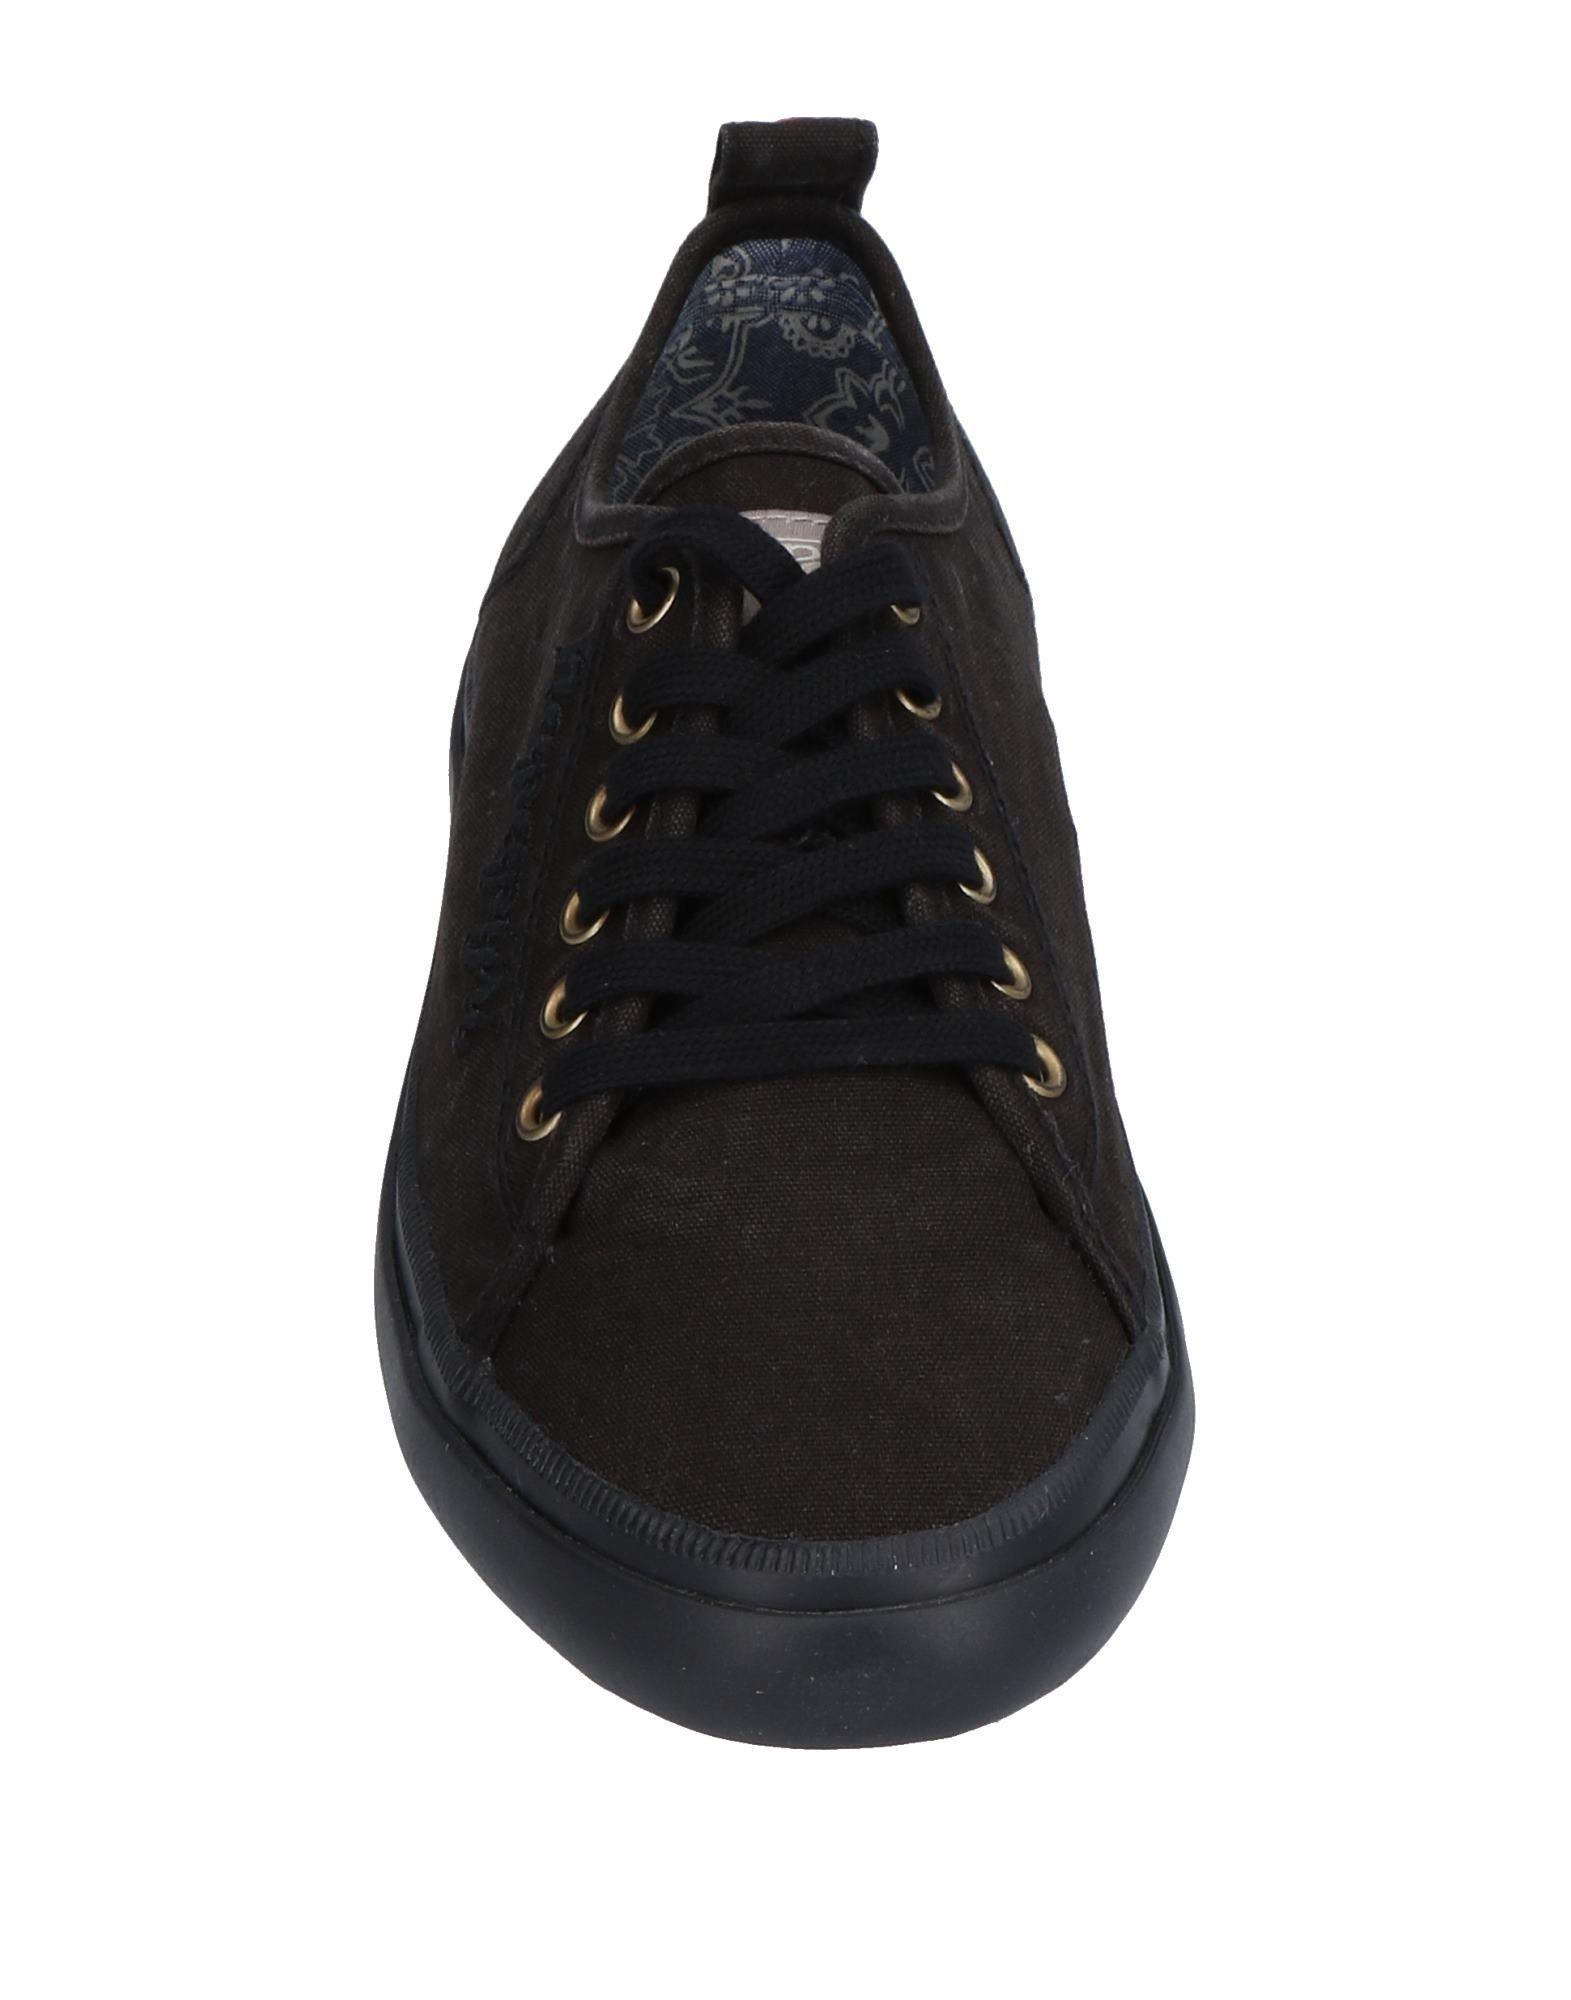 Napapijri Sneakers Damen   Damen 44945426HN  089d36